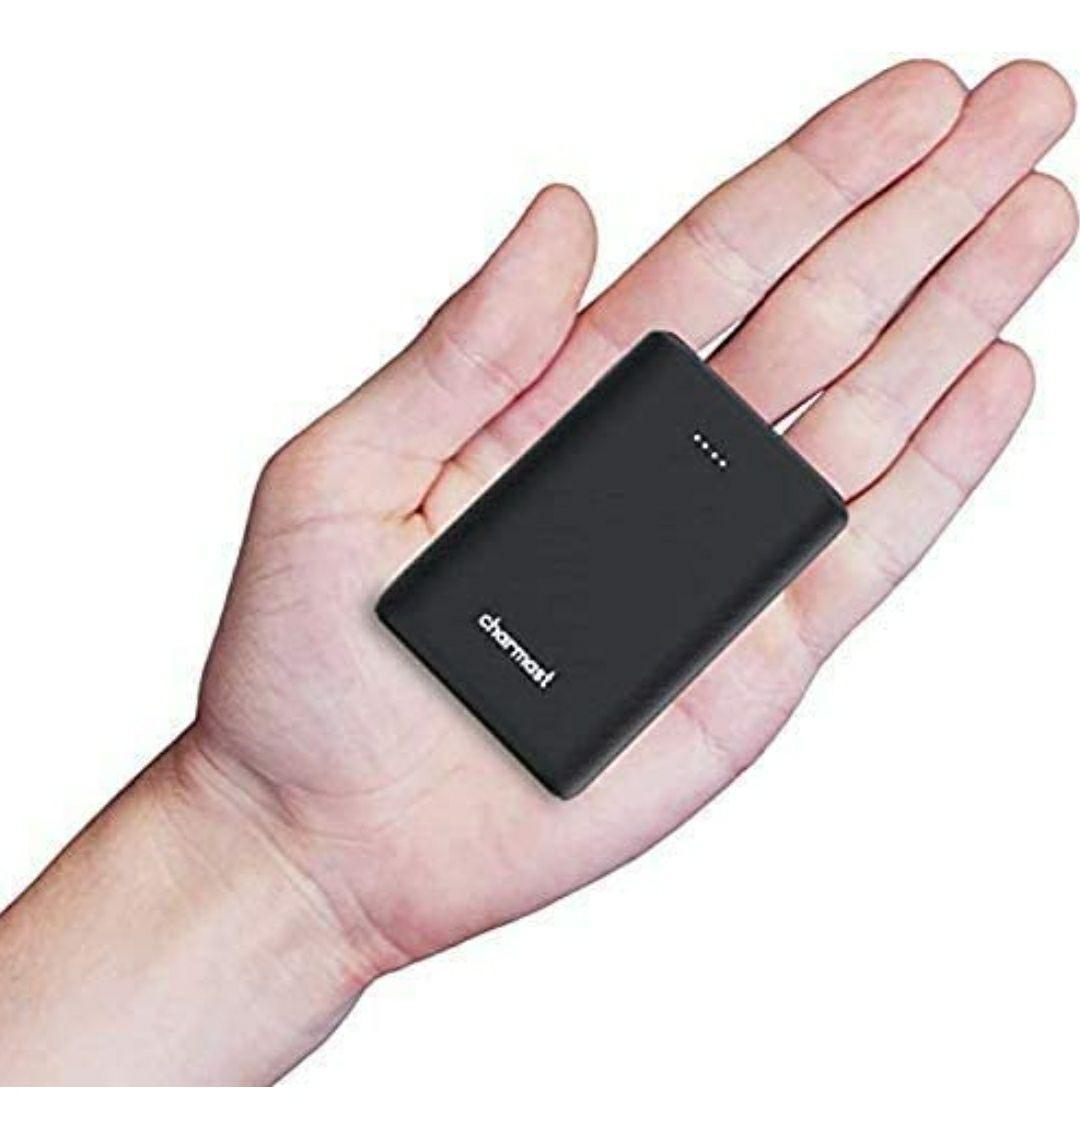 Powerbank Mini 10400mAh,USB C 18W PD e QC 3.0